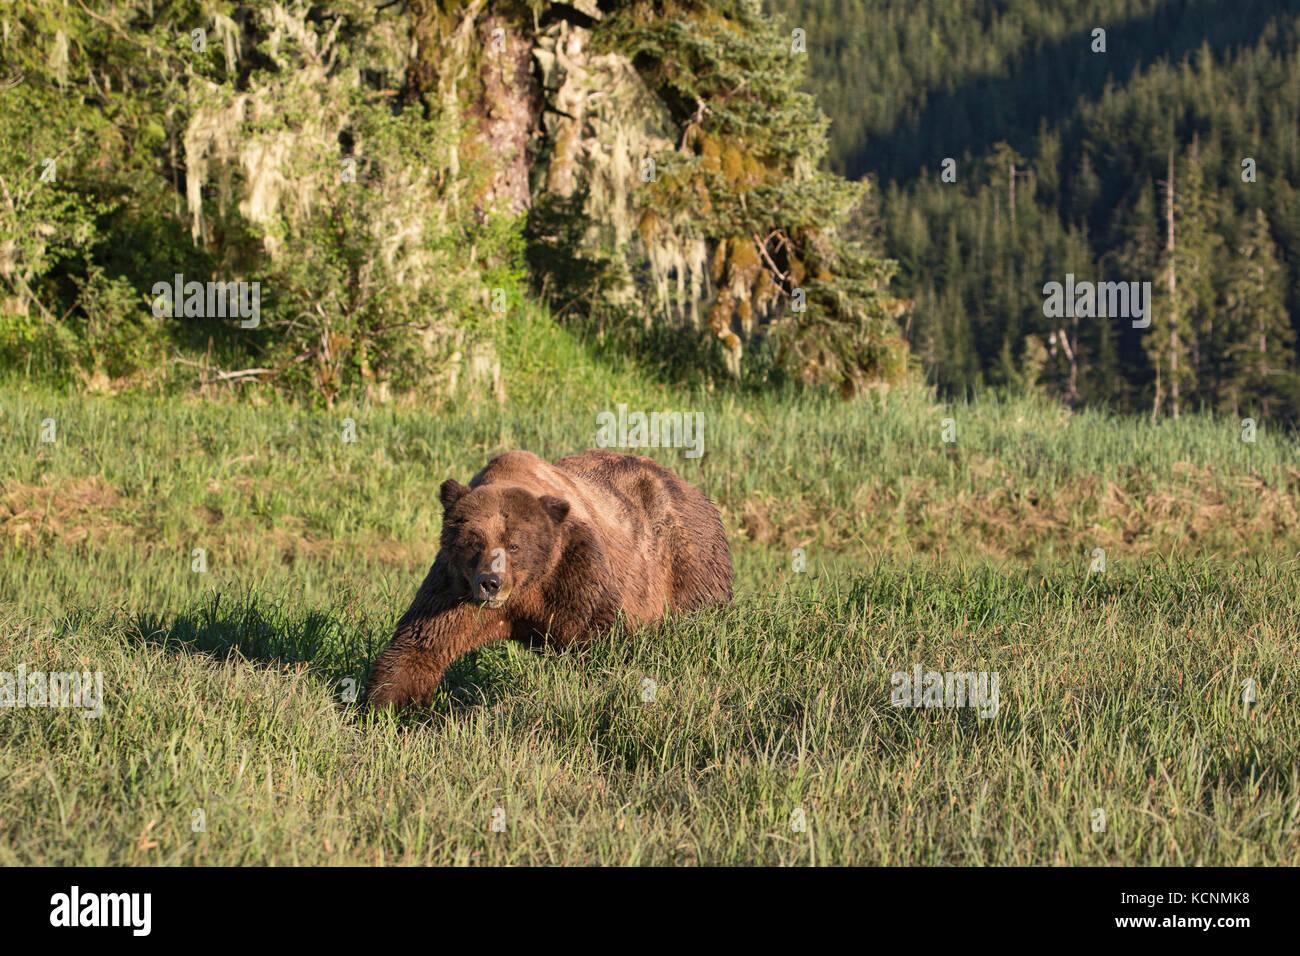 Grizzly bear (Ursus arctos horriblis), large scarred male, eating Lyngbye's sedge (Carex lyngbye),  Kwinimass - Stock Image